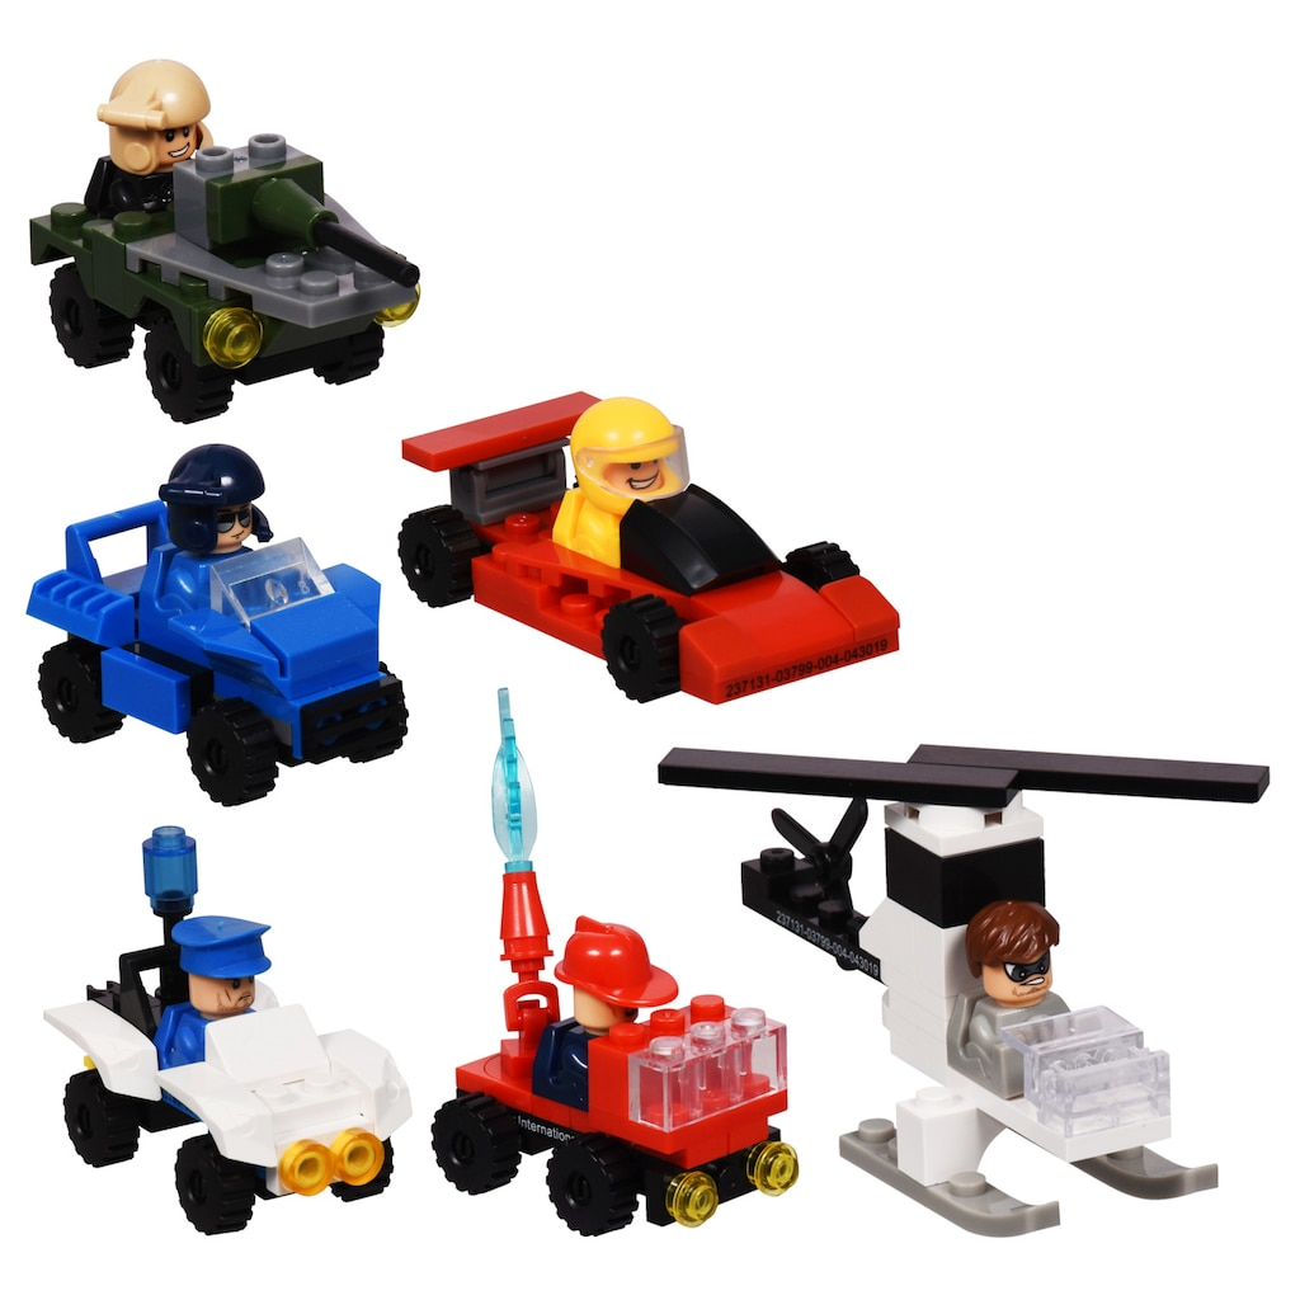 Lego - Dollar Tree, Inc.